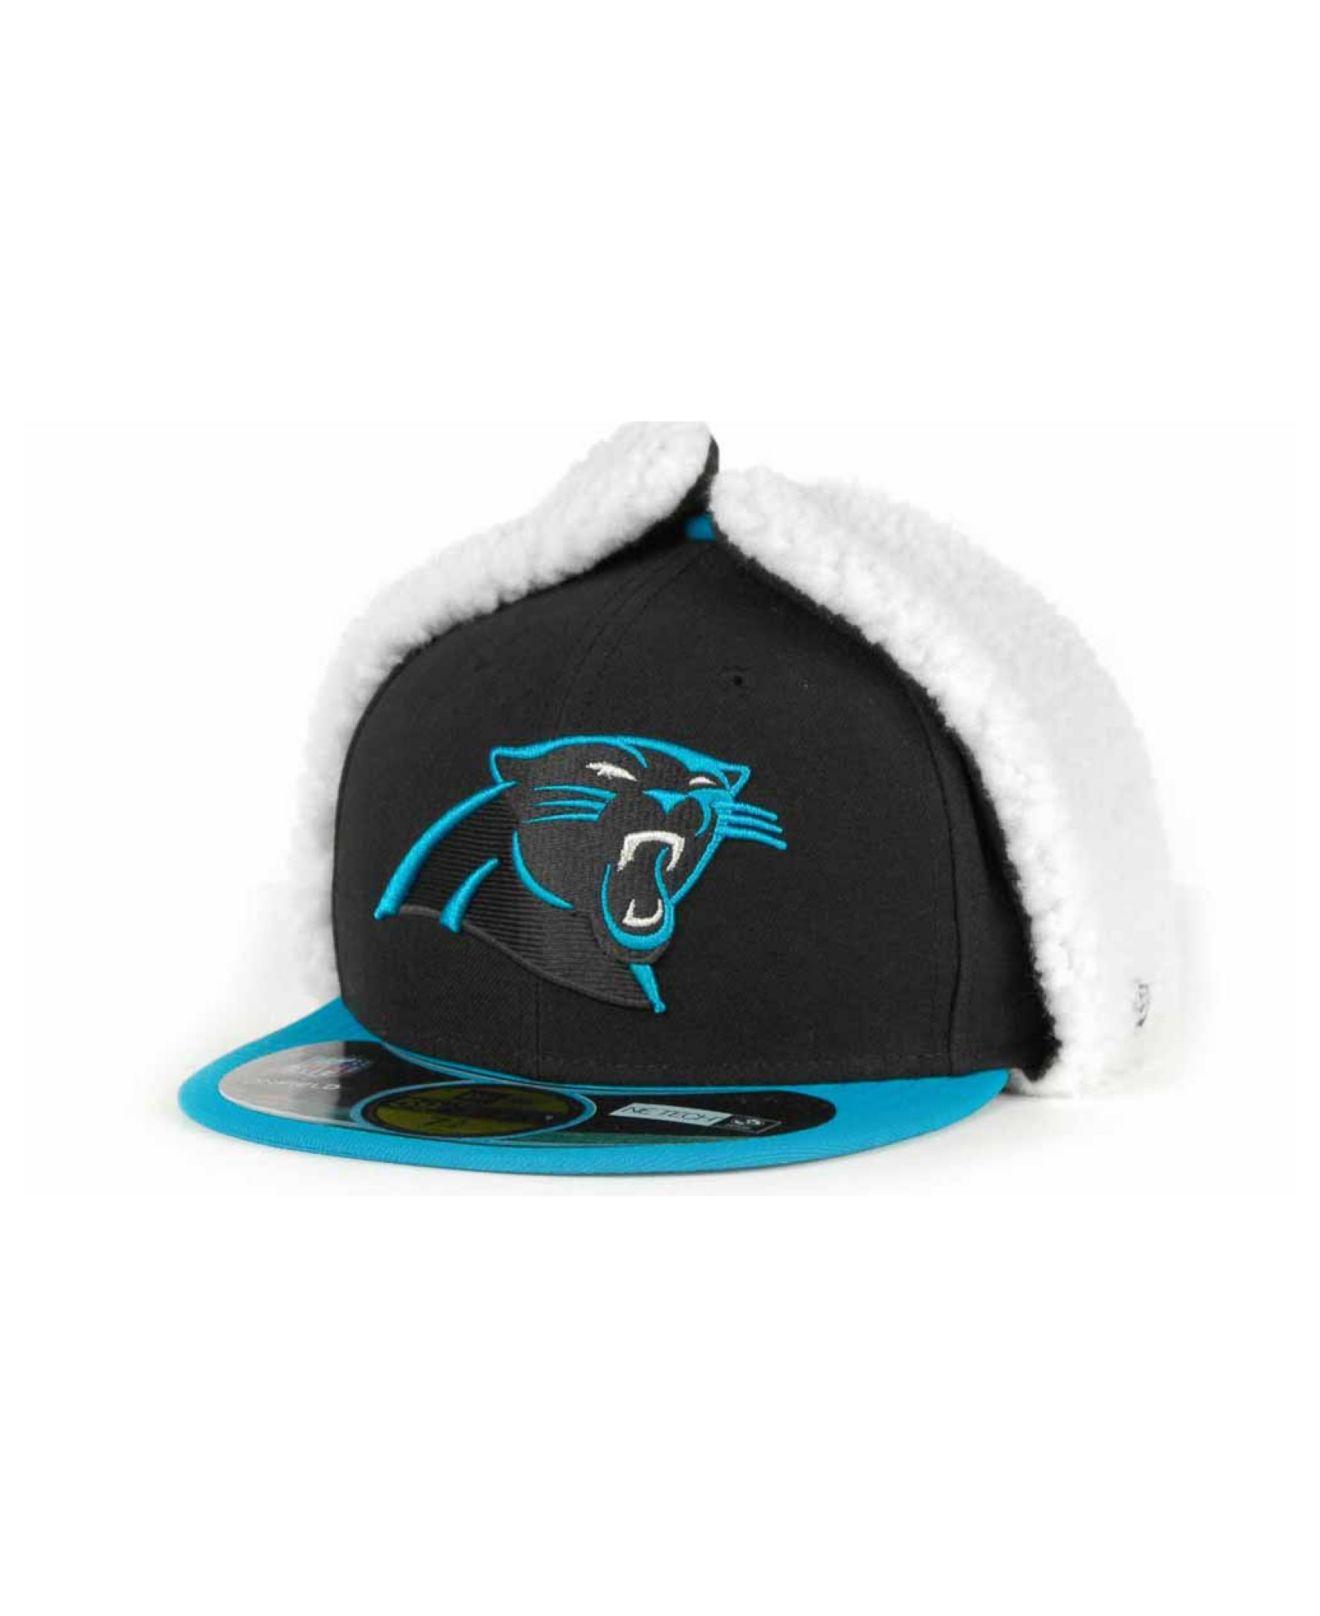 Lyst - KTZ Carolina Panthers On-field Dog Ear 59fifty Cap in Black ... 6fe0e6601fac